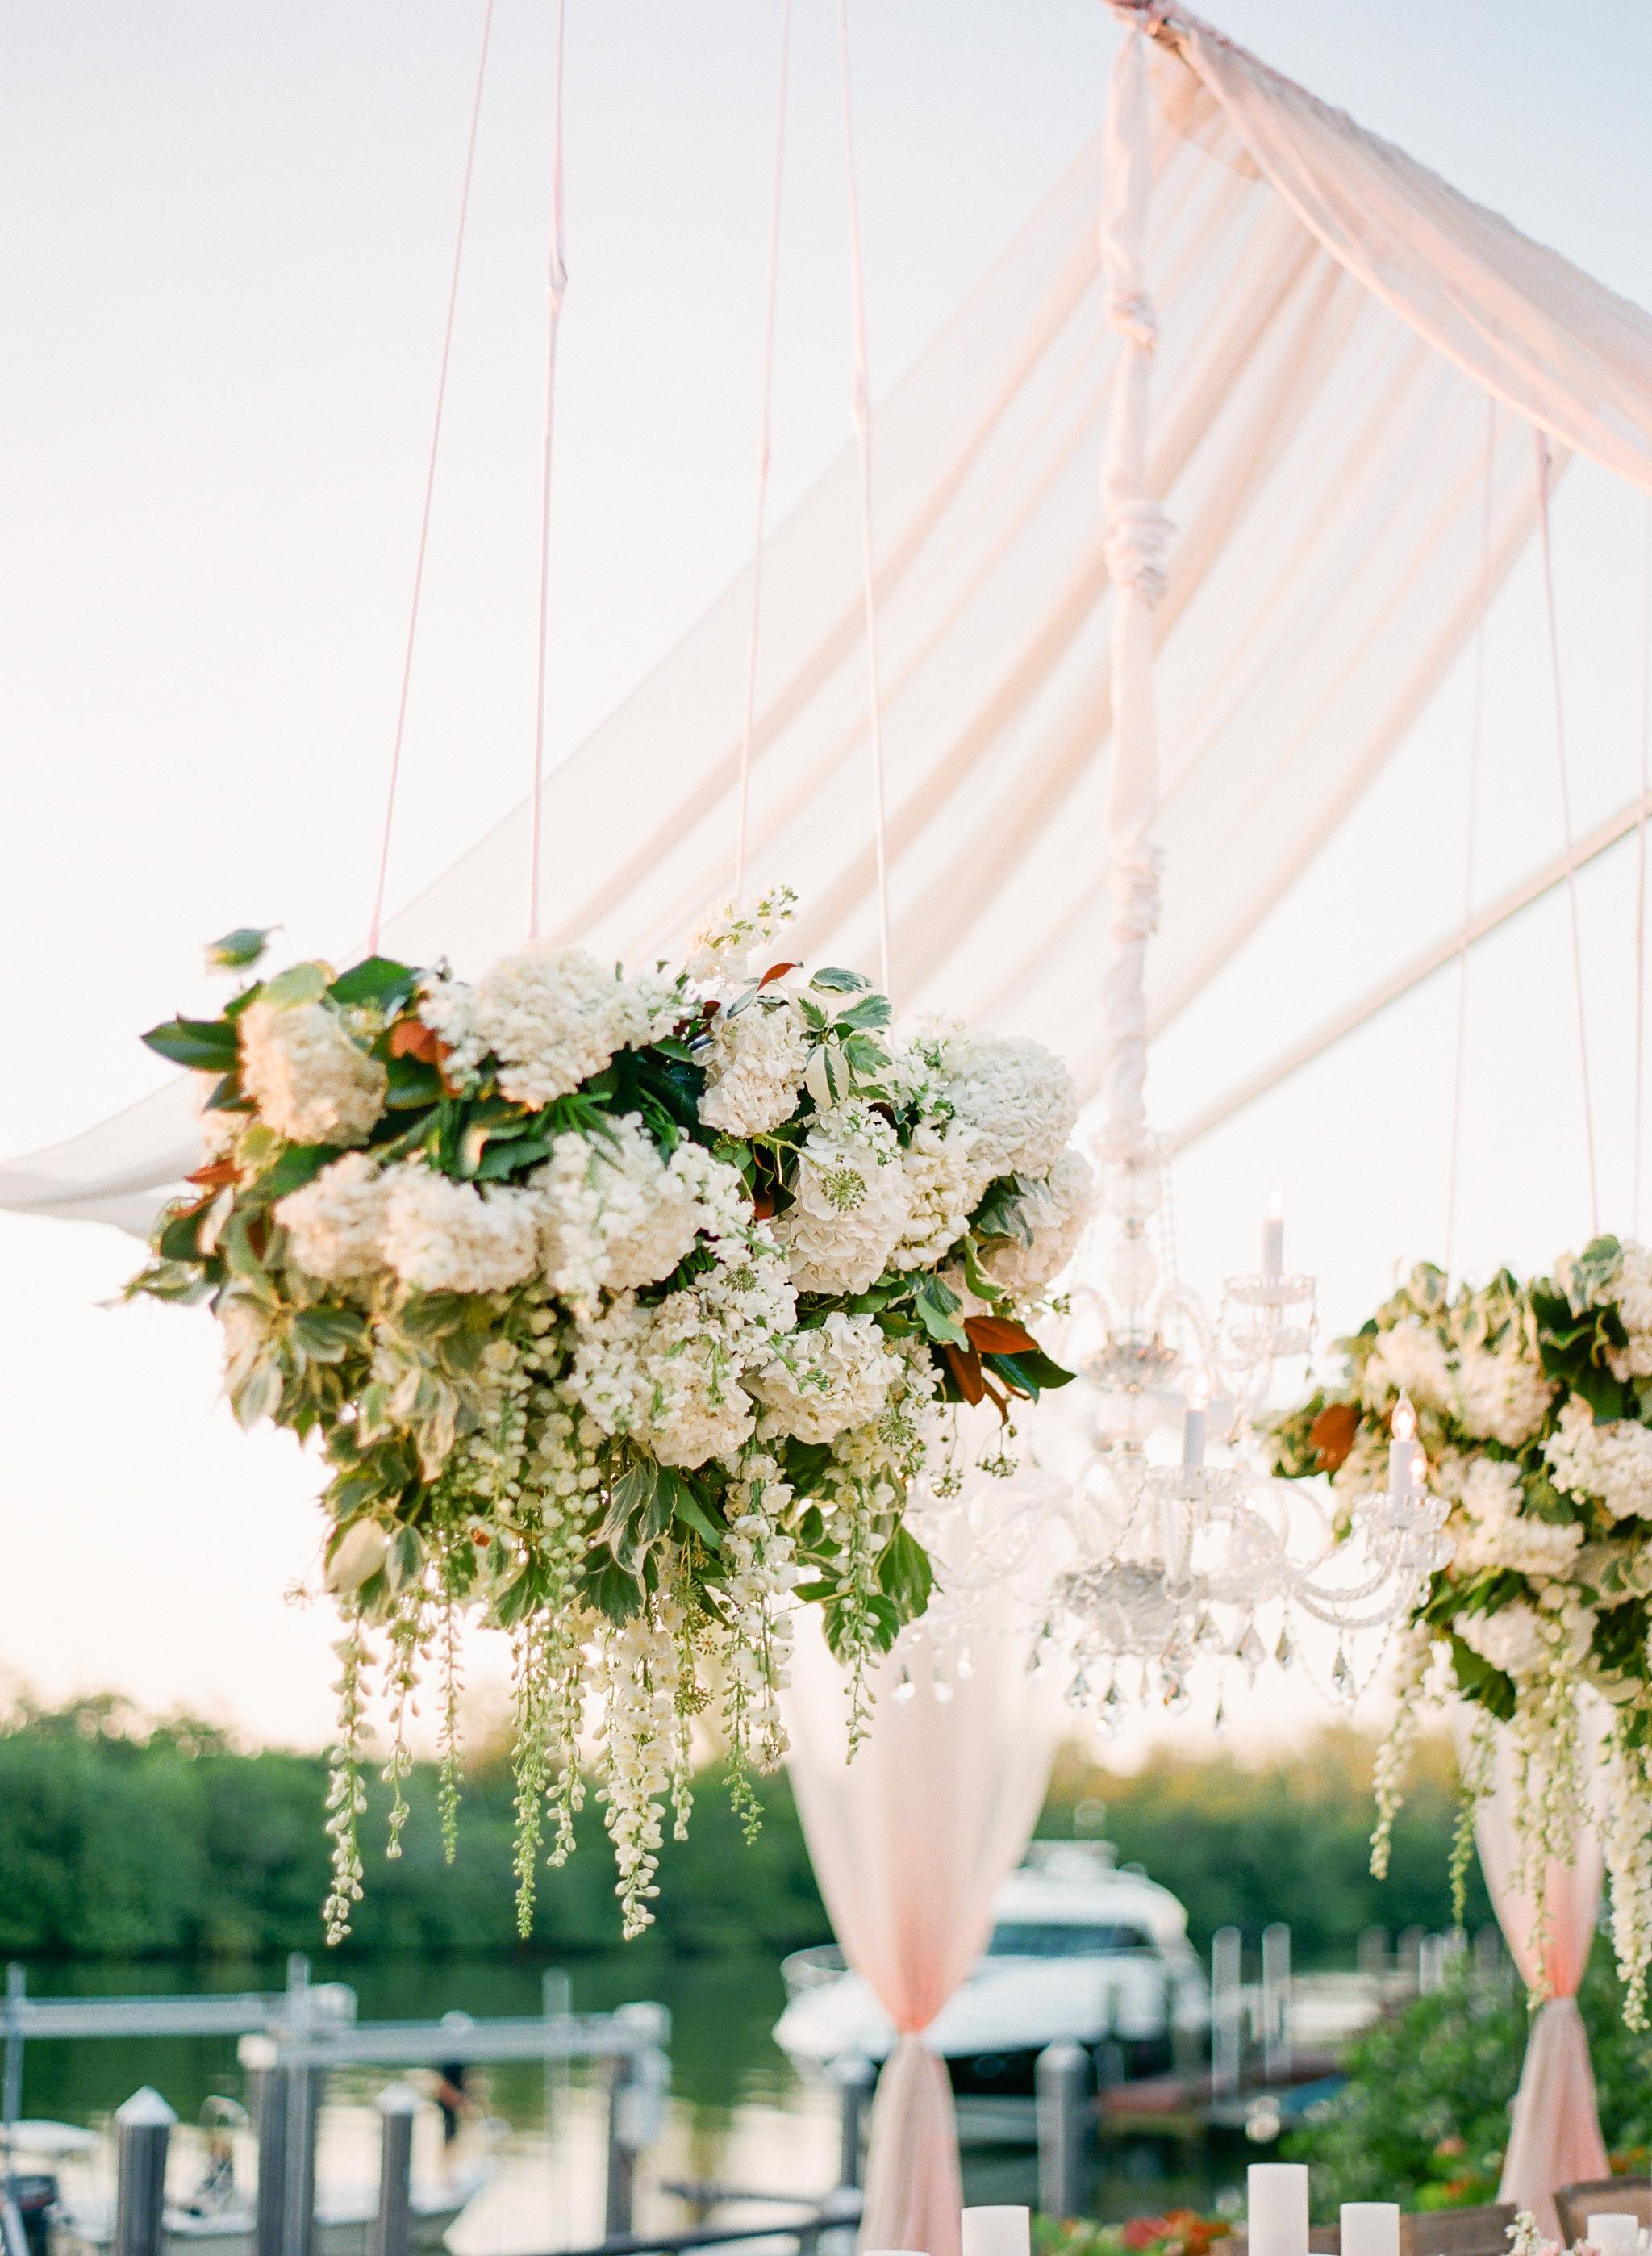 Ceci_New_York_Florida_Wedding_Style_Bride_Watercolor_Real_Custom_Luxury_130.jpg